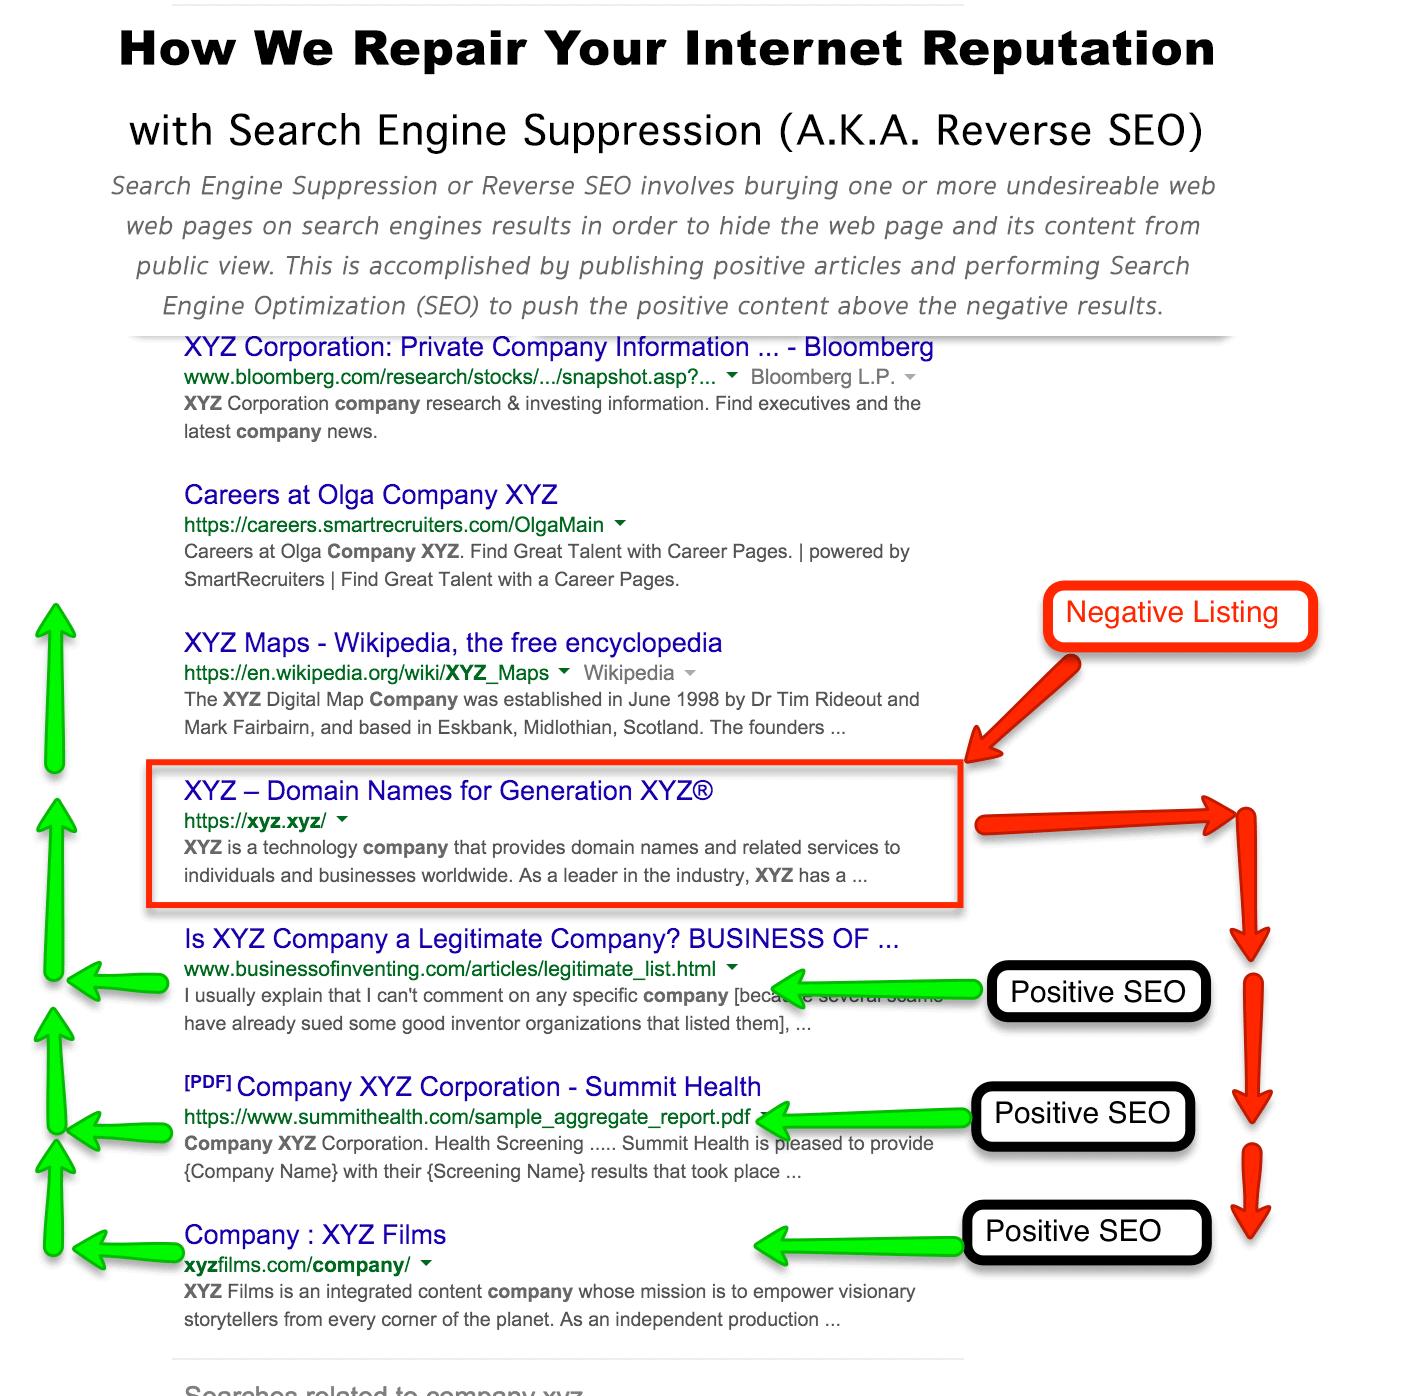 Reverse SEO Reputation Repair Strategy